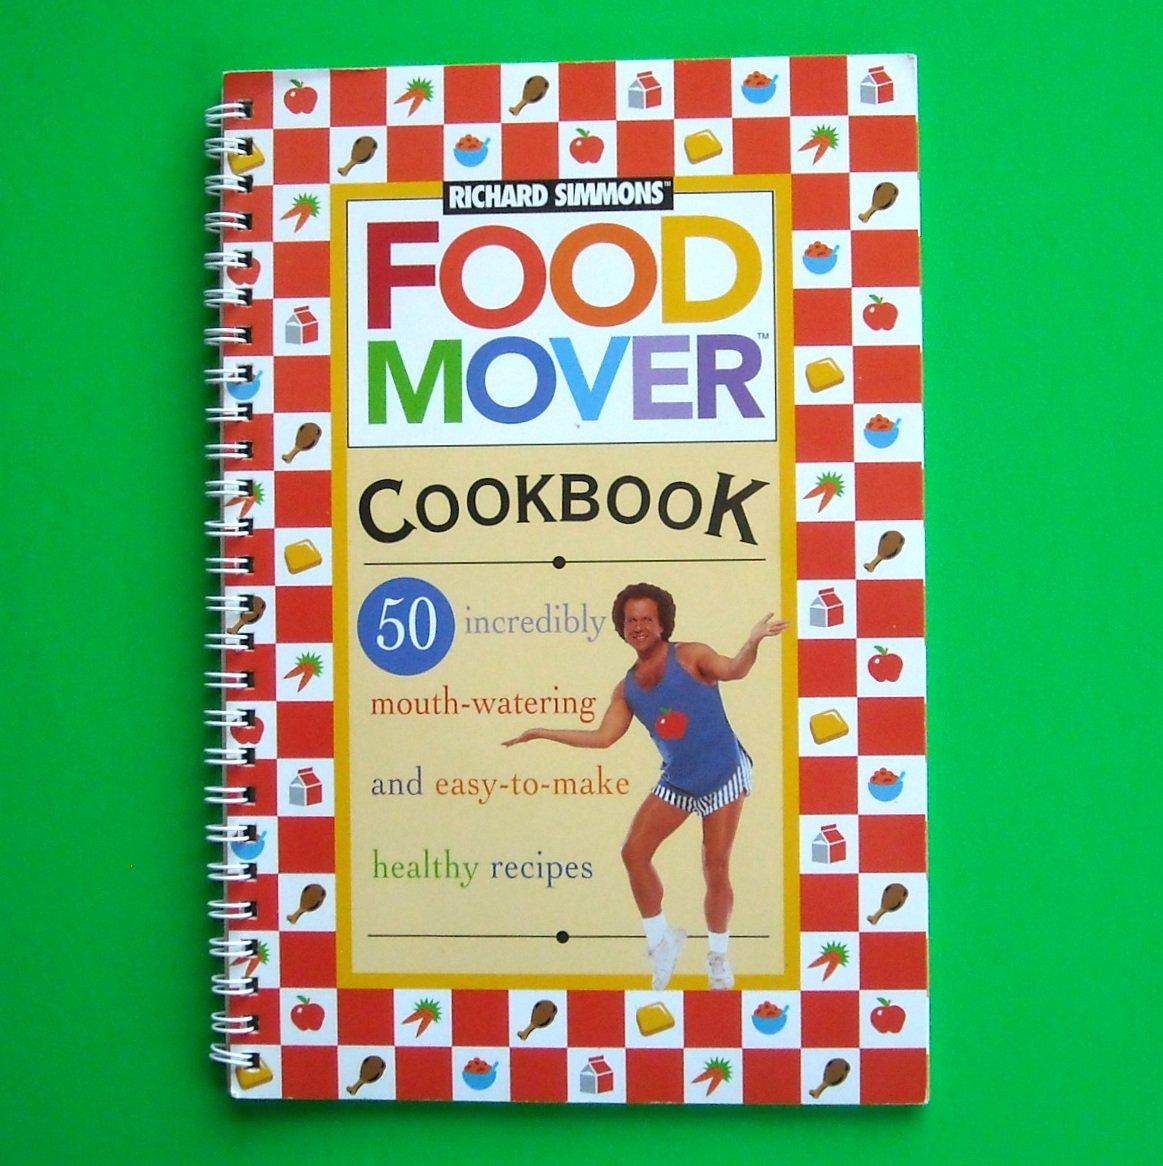 Richard Simmons Food Mover Cookbook